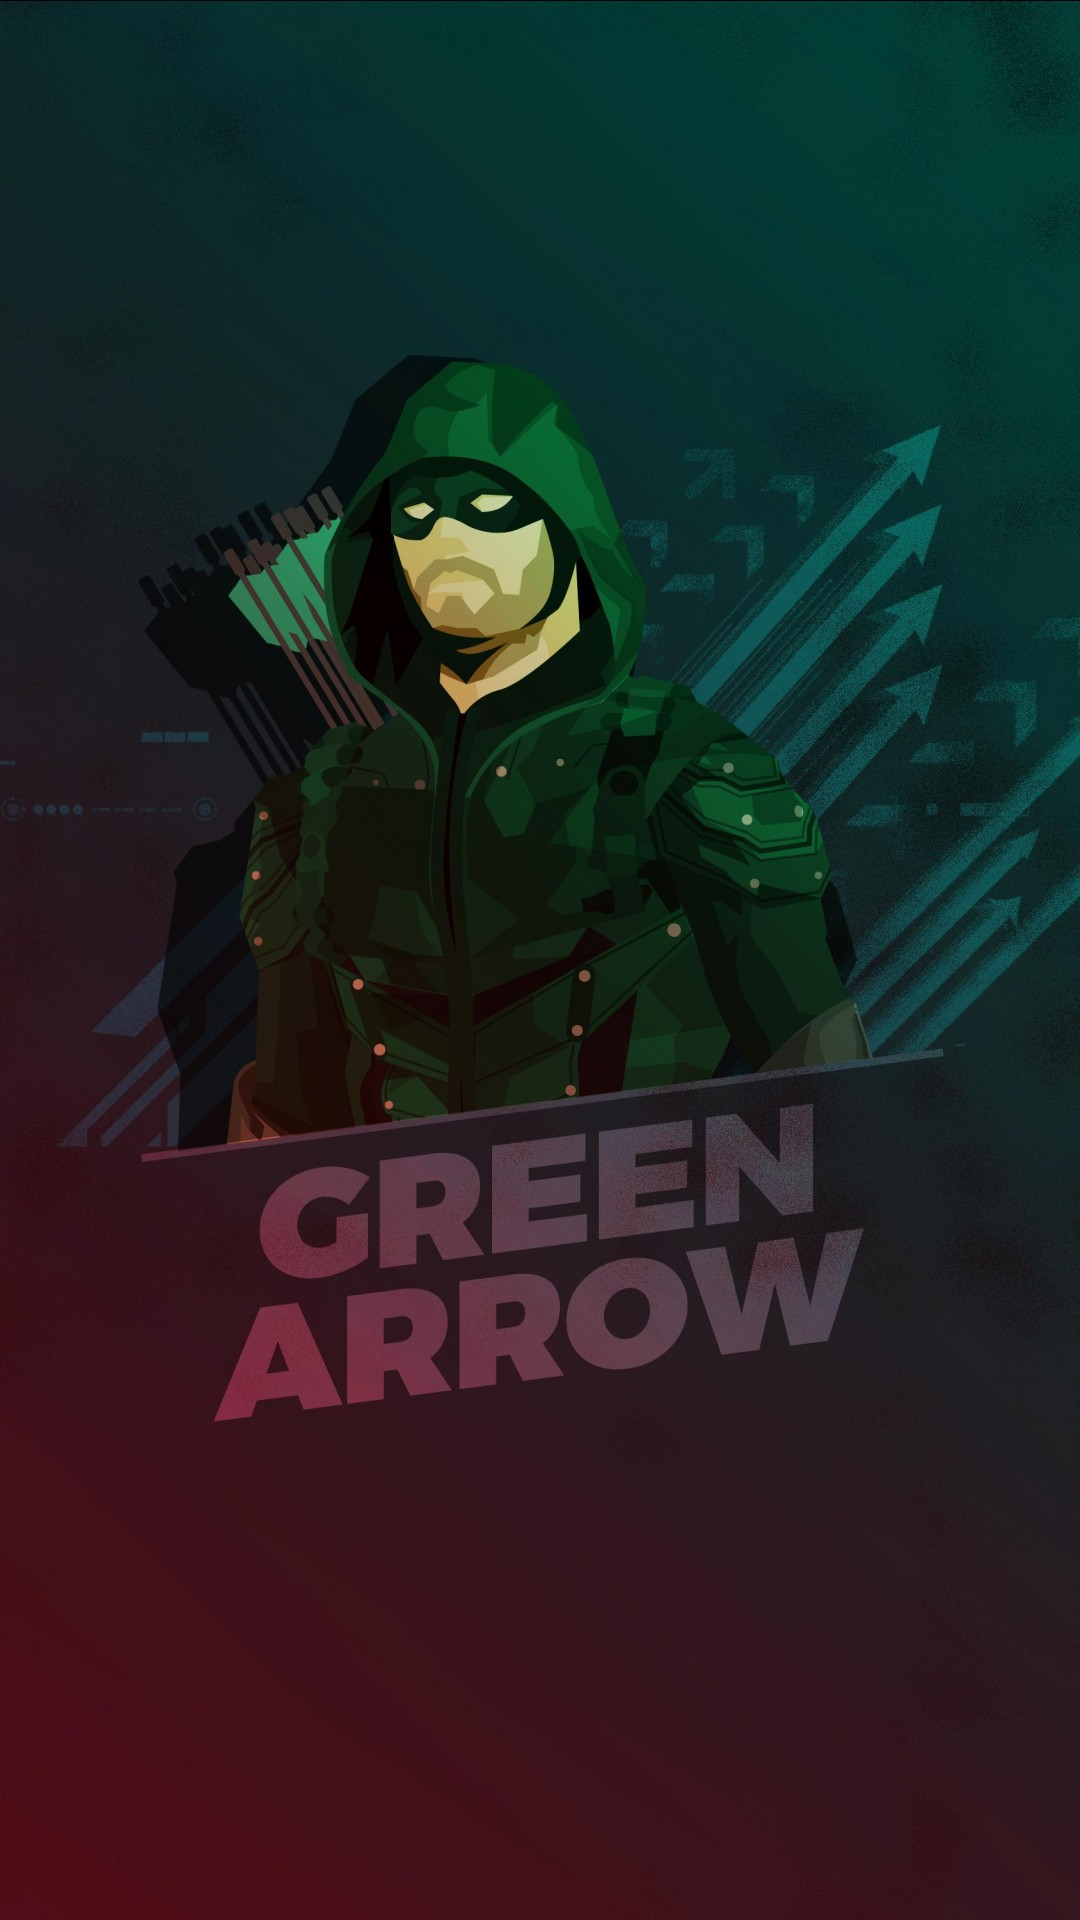 Top Hd 3d Wallpaper For Mobile Green Arrow Minimal Artwork Hd Wallpapers Hd Wallpapers